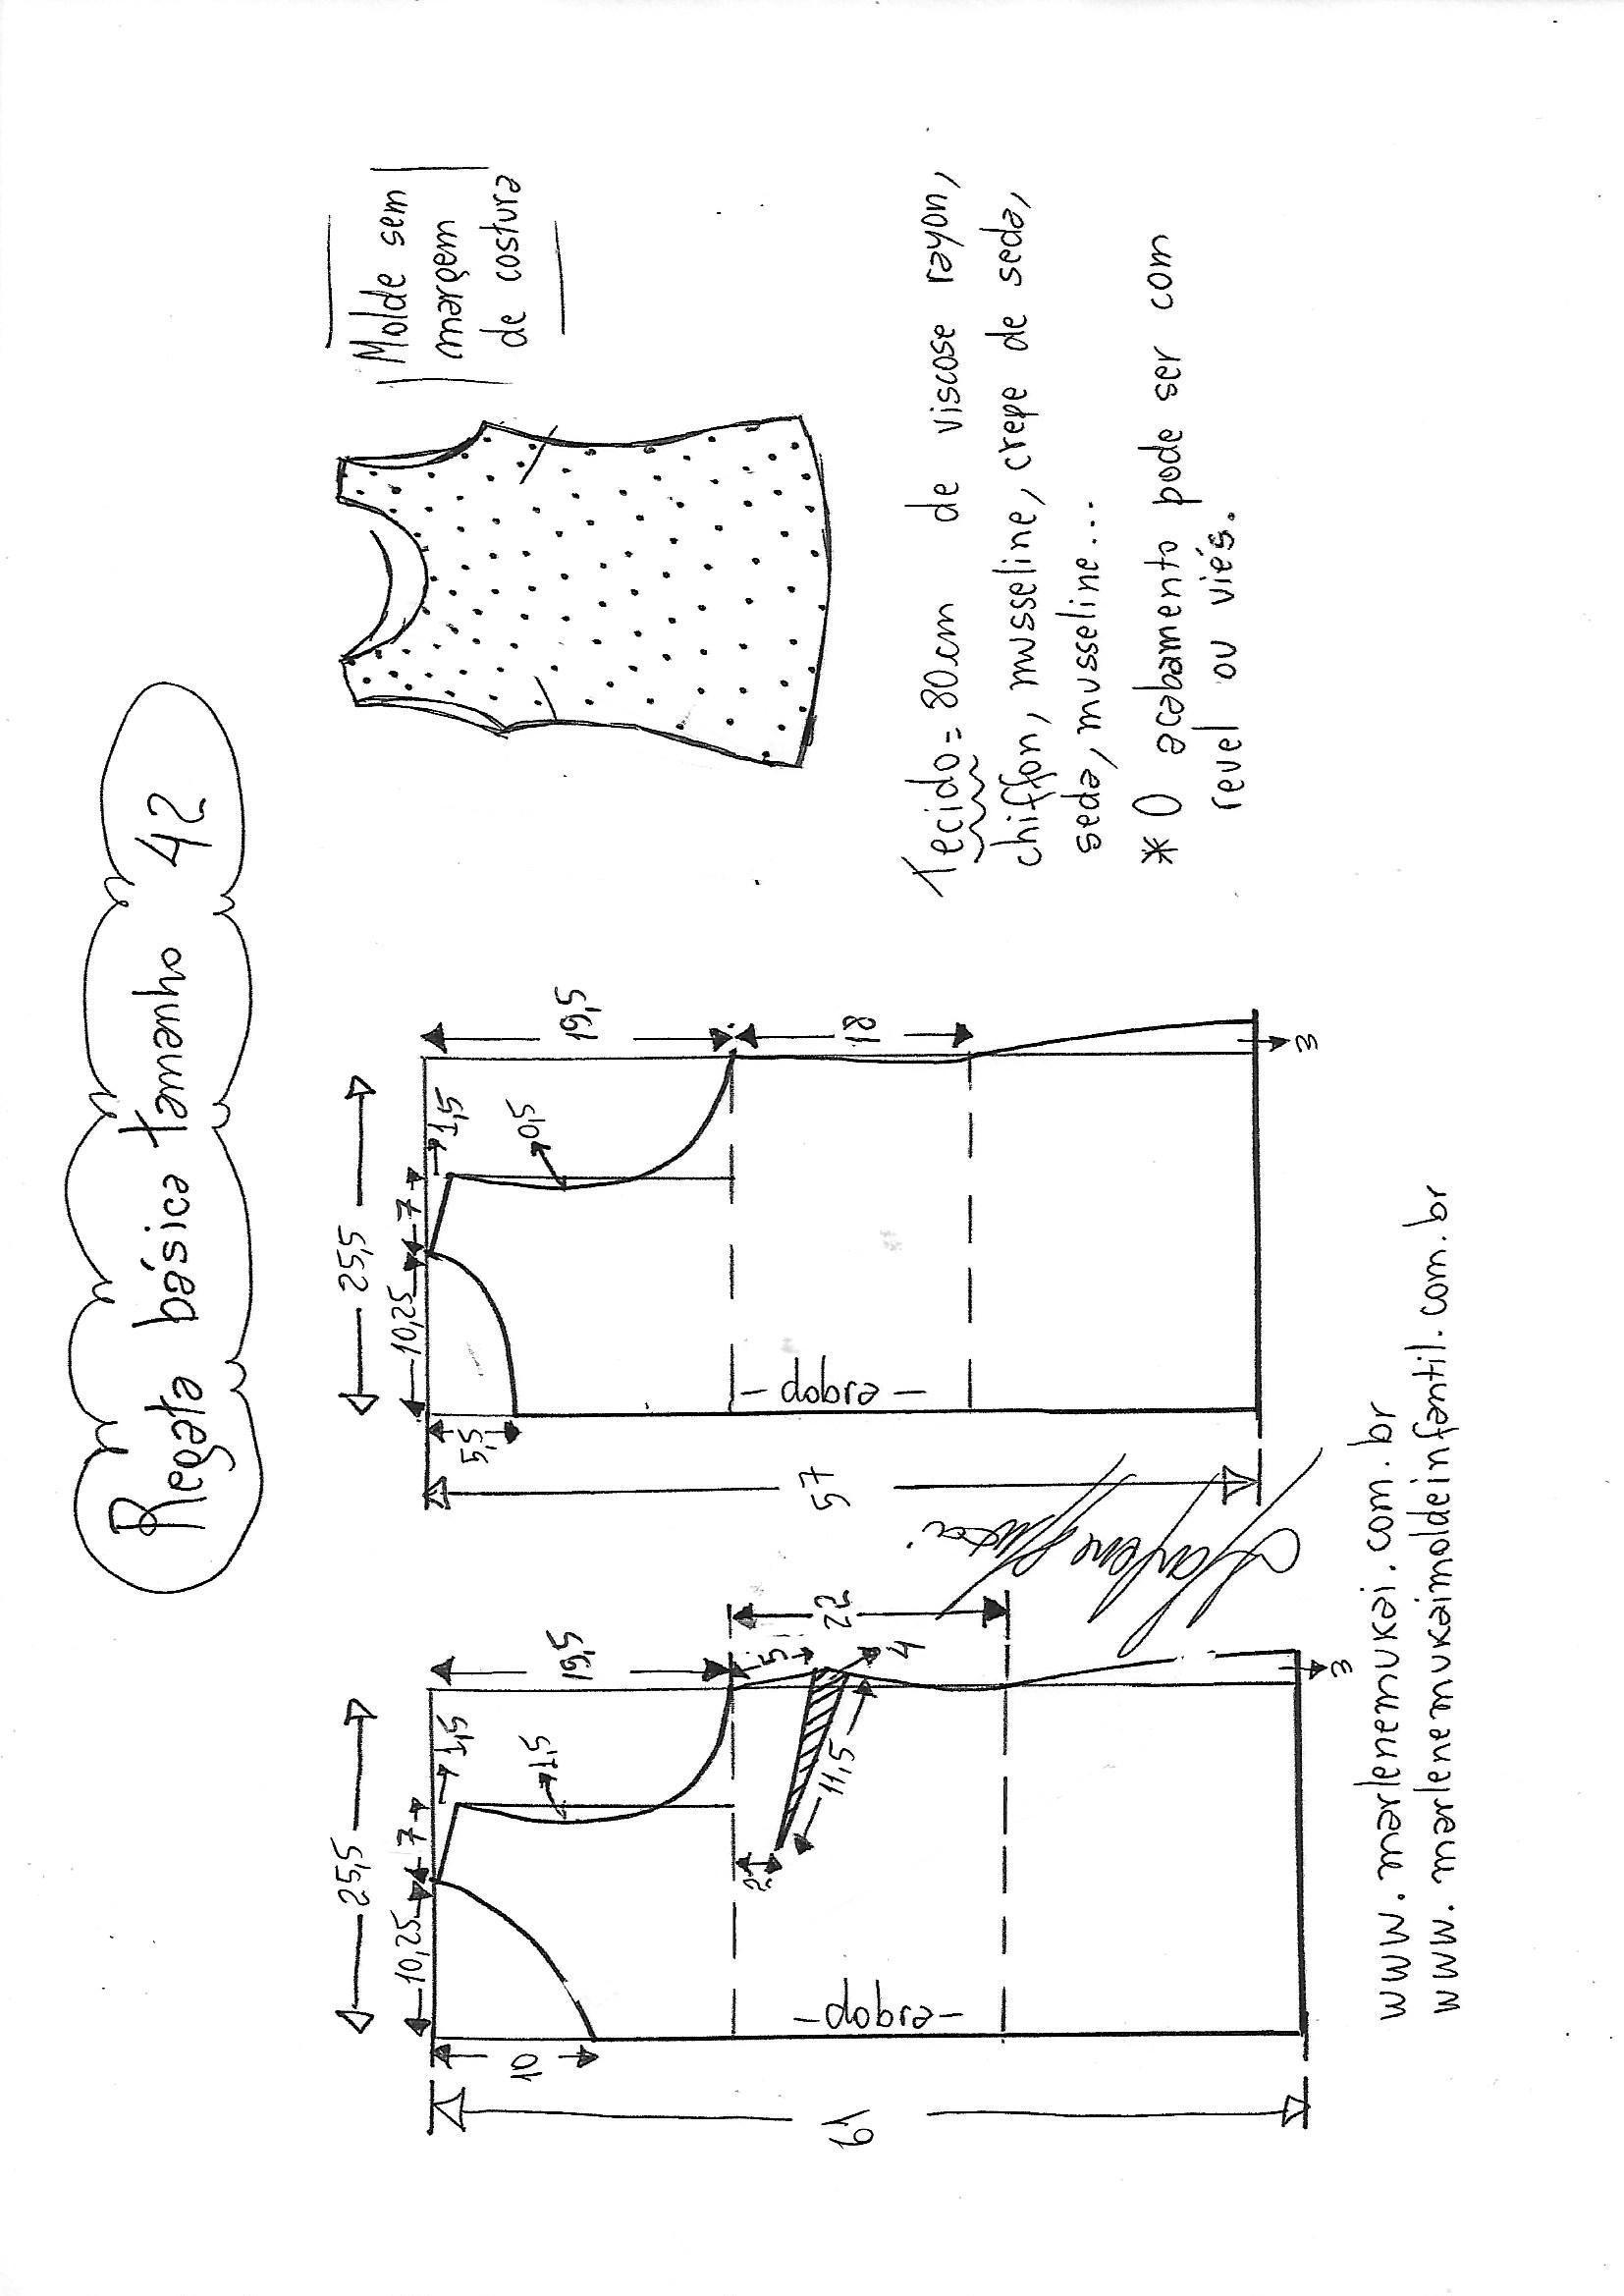 Pin de old me ... old id en blusas casuales | Pinterest | Costura ...